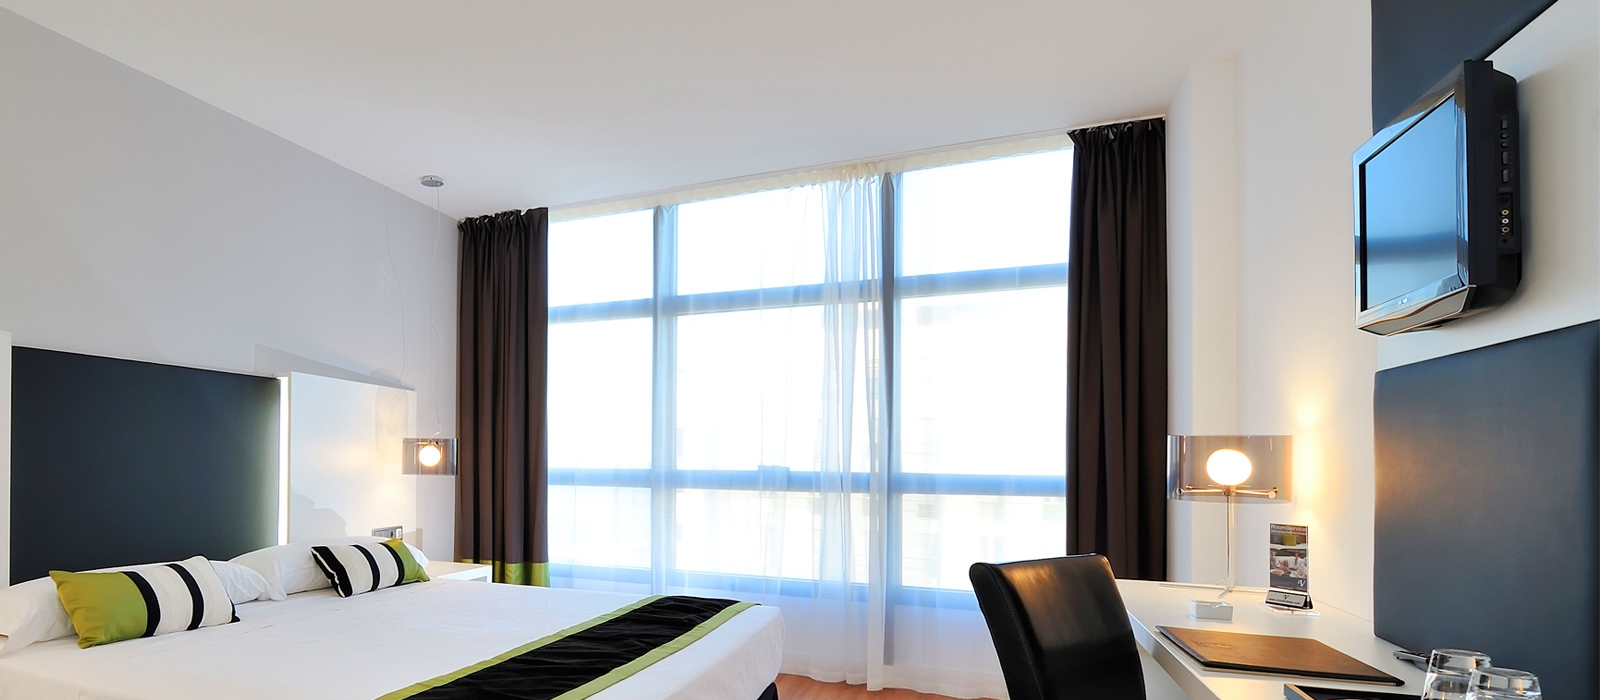 Standard - Camere Hotel Malaga - Vincci Hoteles